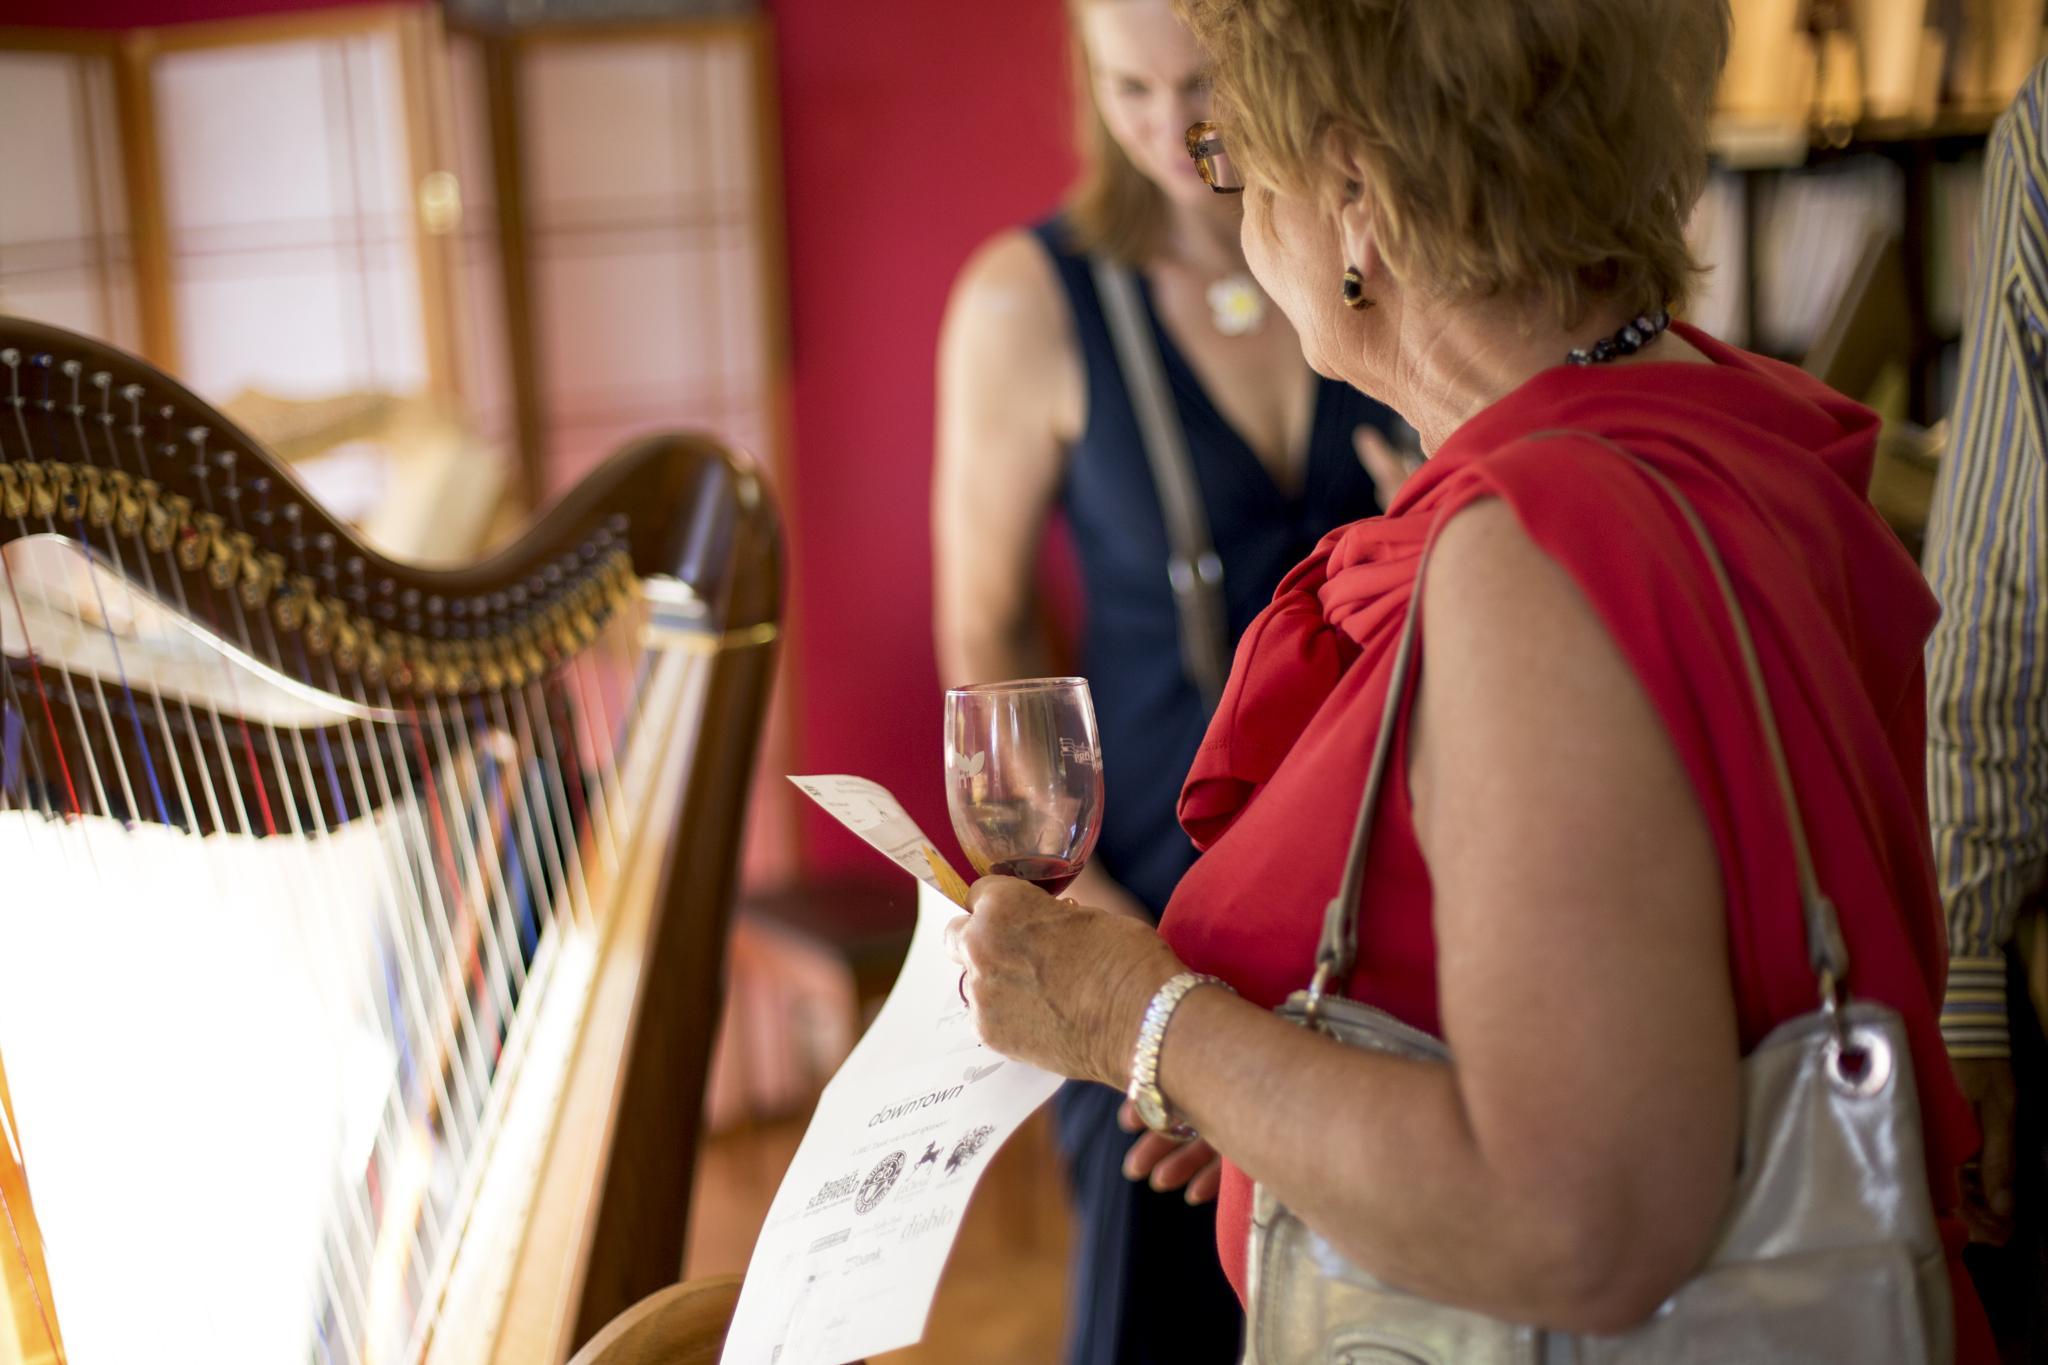 Harps by Kyle Luman